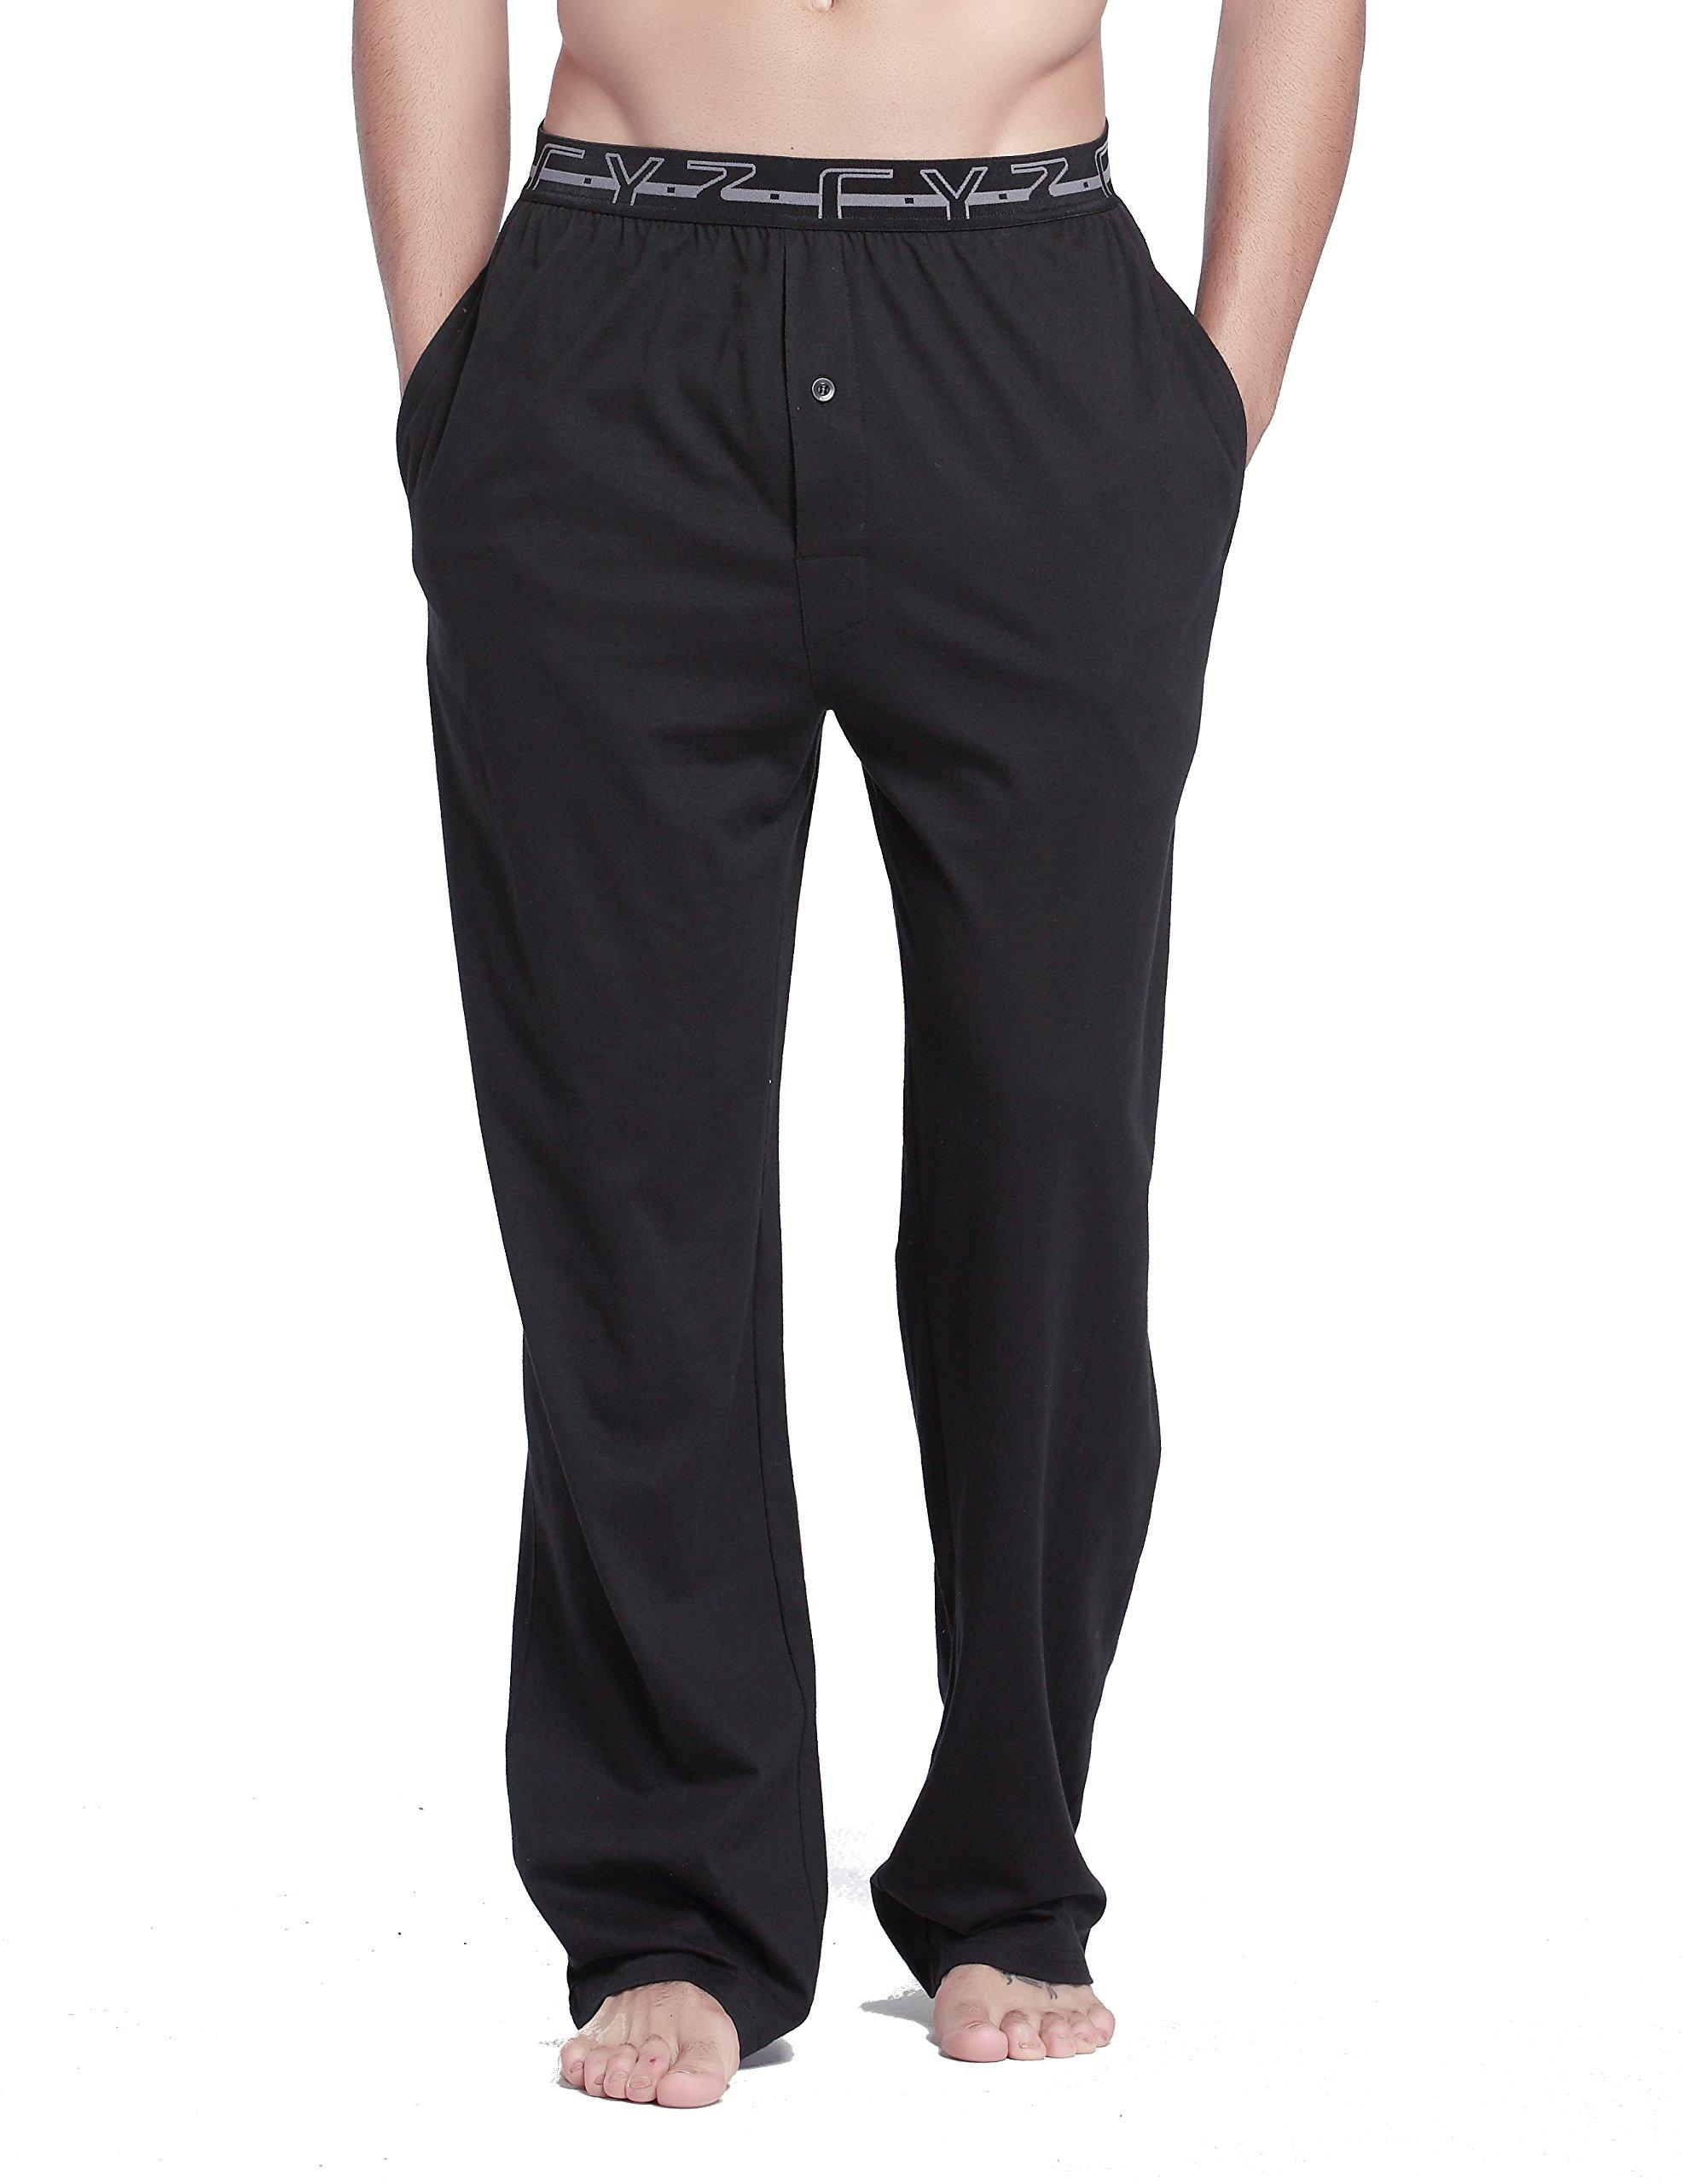 CYZ Men's 100% Cotton Jersey Knit Pajama Sleep/Lounge Pants-Black-M